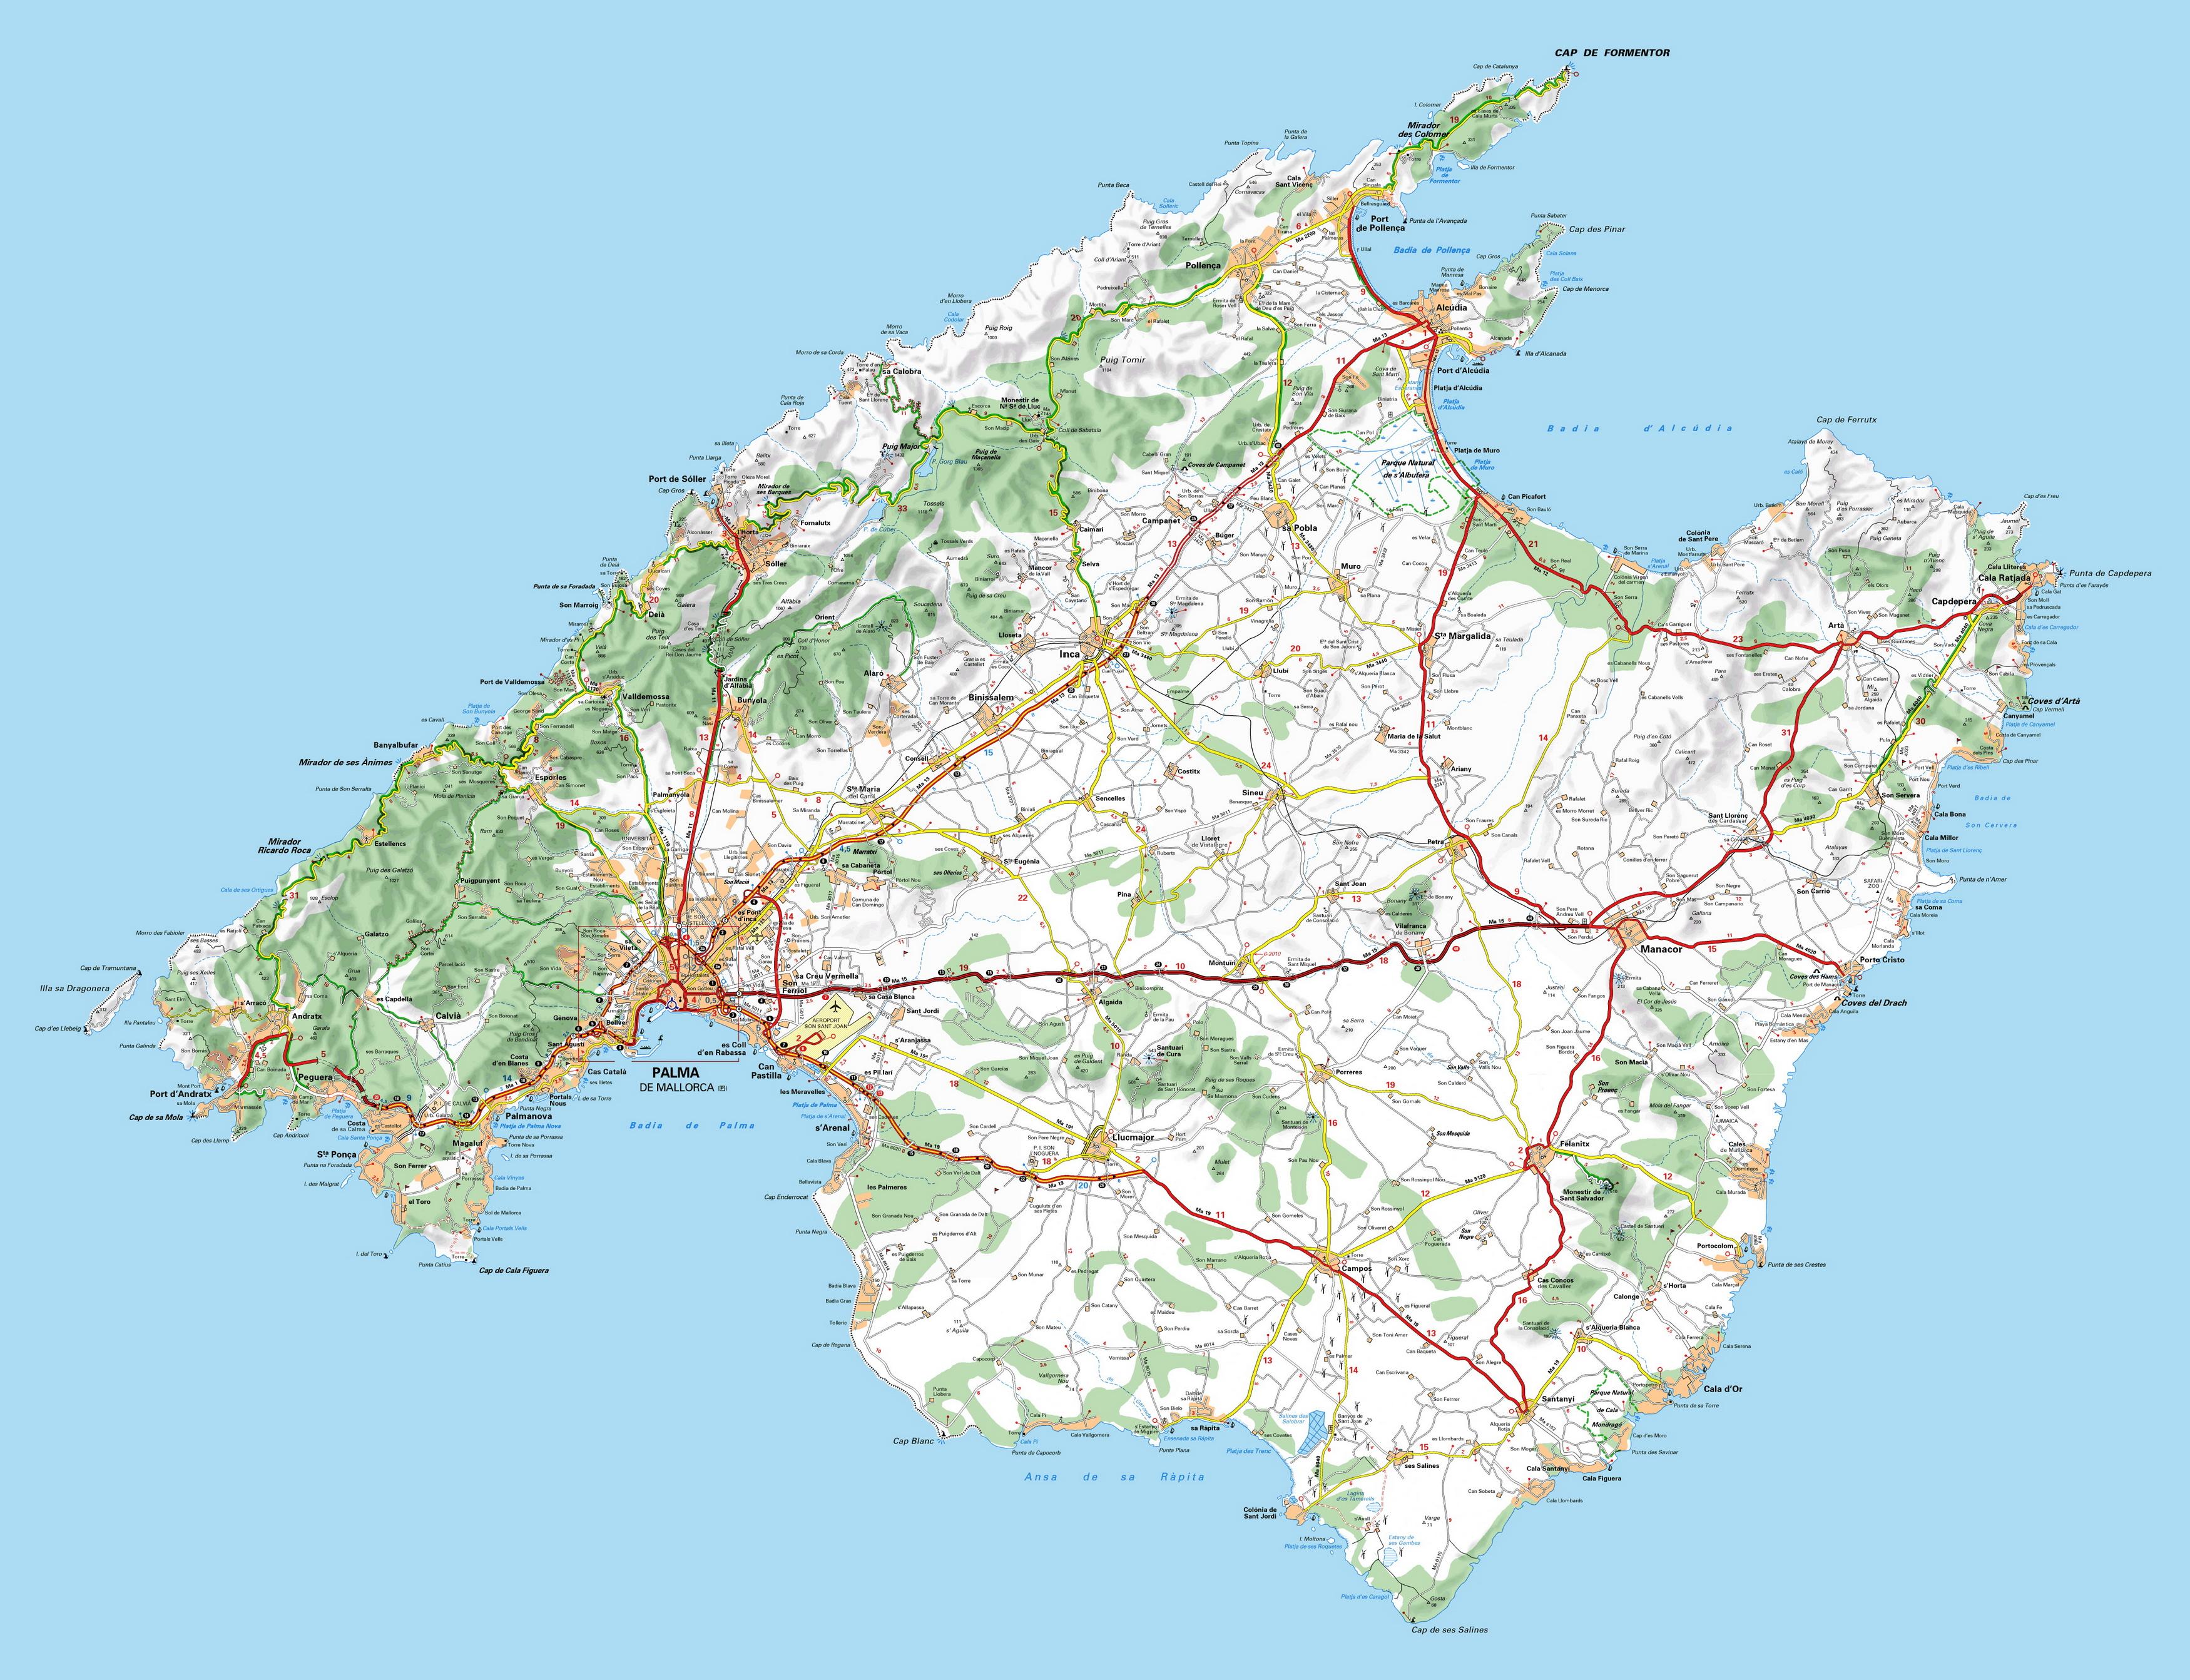 Mapa Mallorca Carreteras Al Sur De Un Horizonte